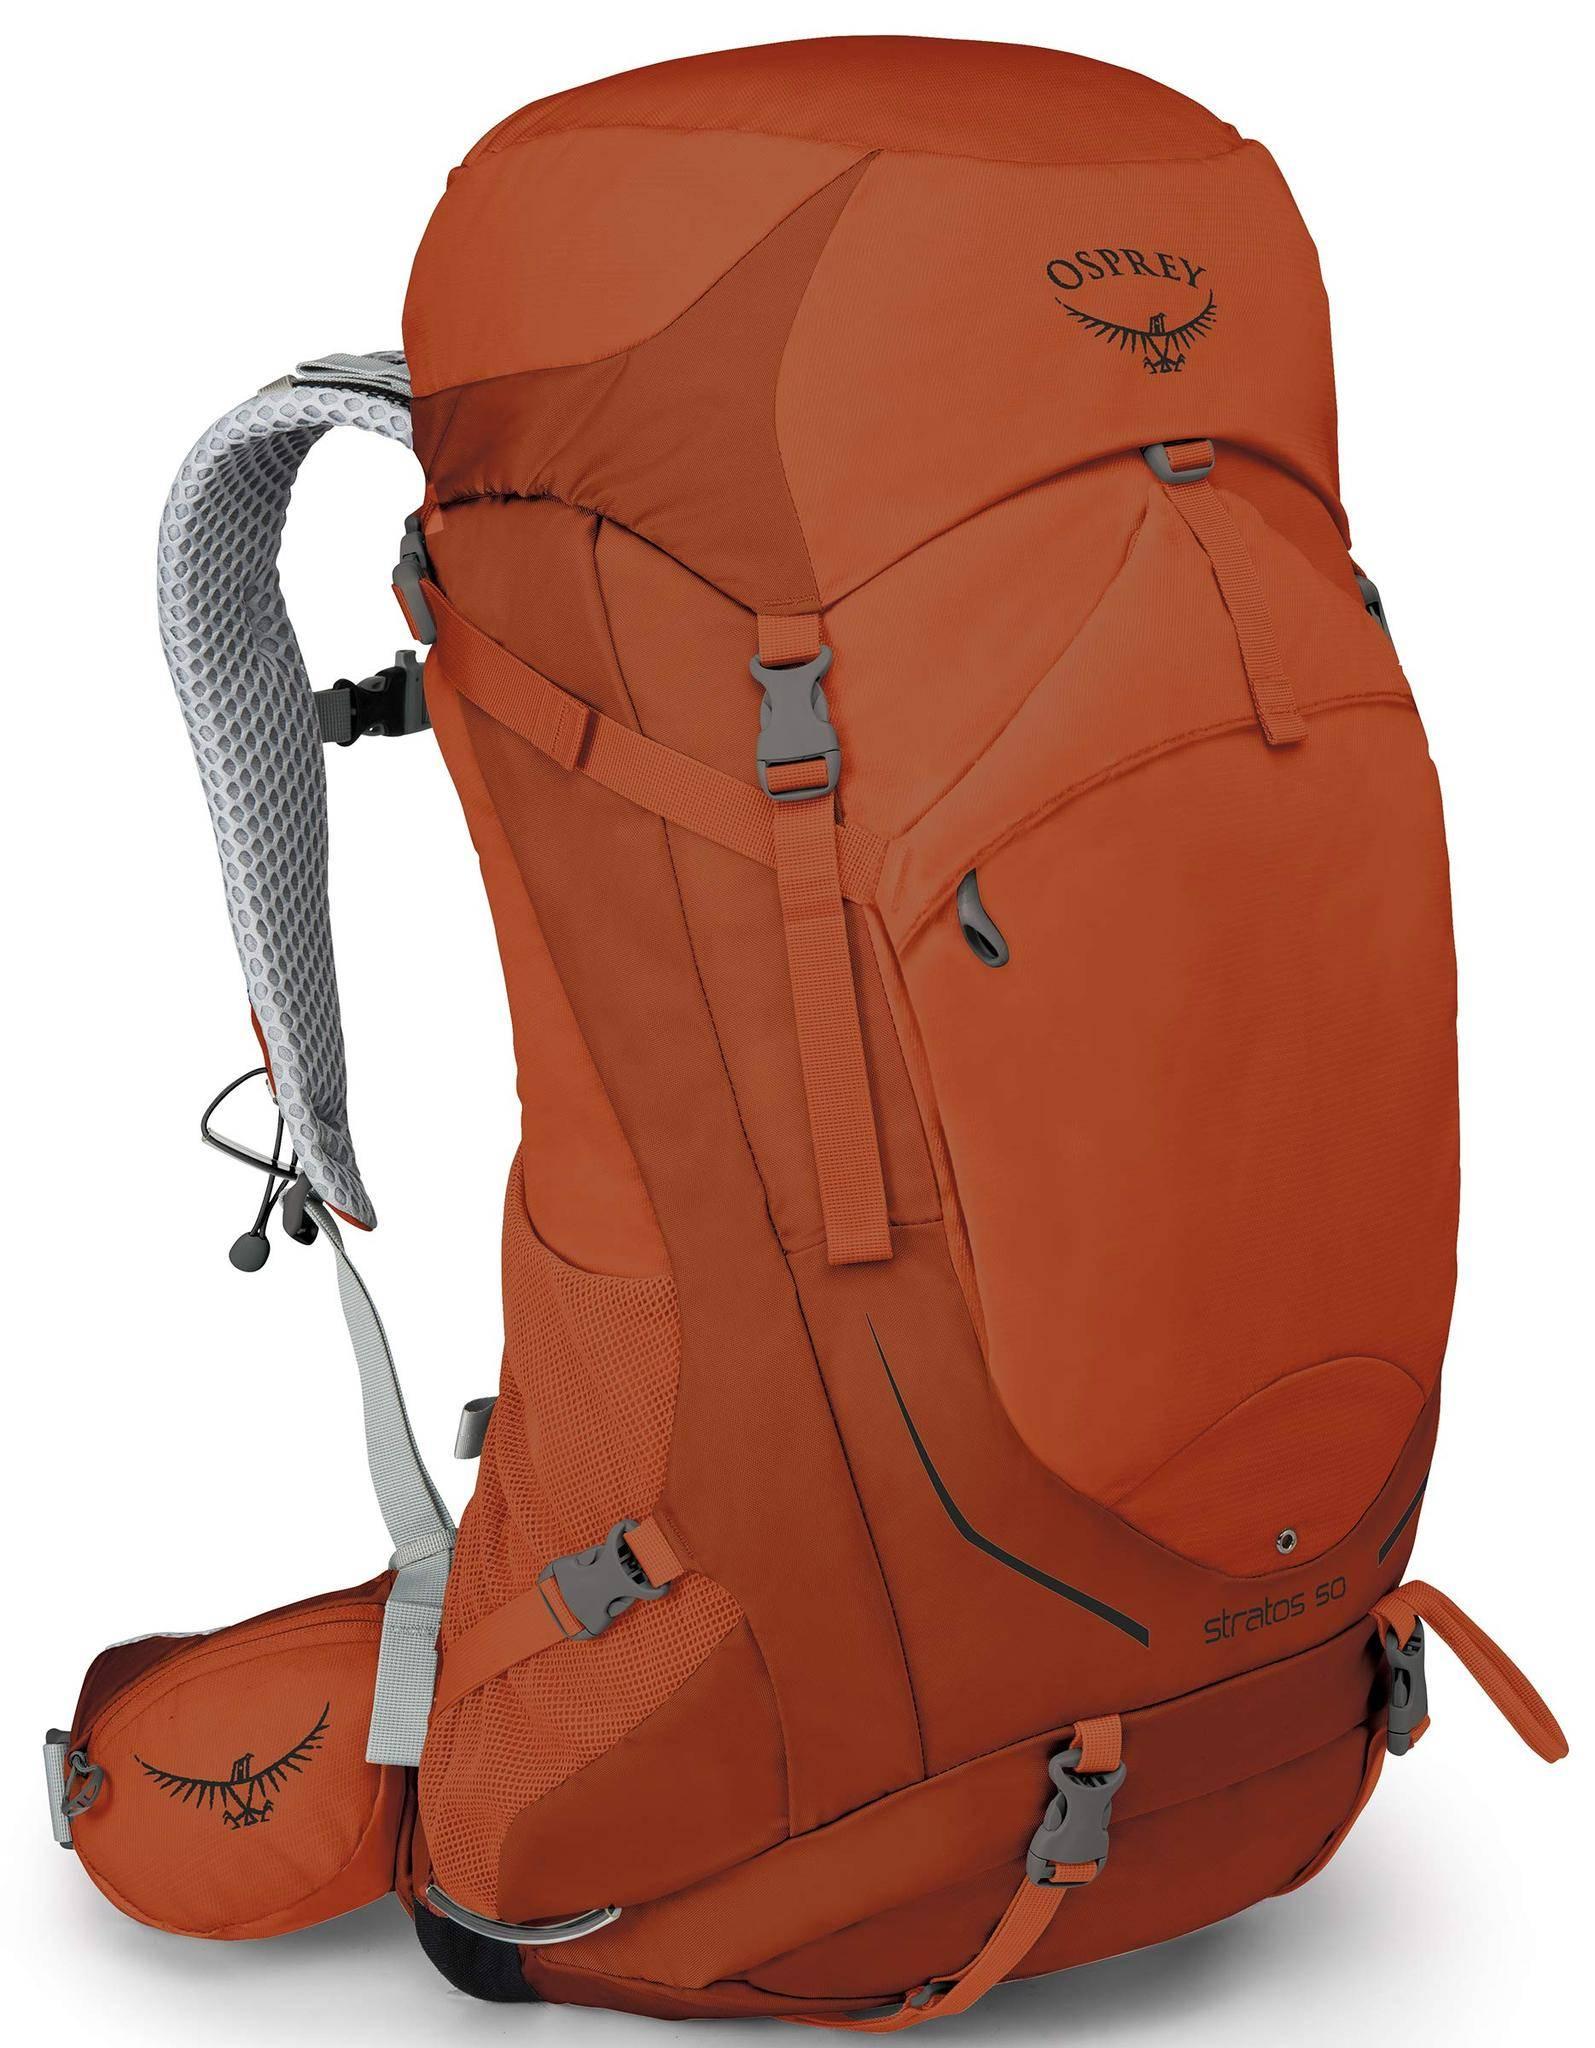 Osprey Packs Stratos 50 Backpacking Backpack | Konnichi wa